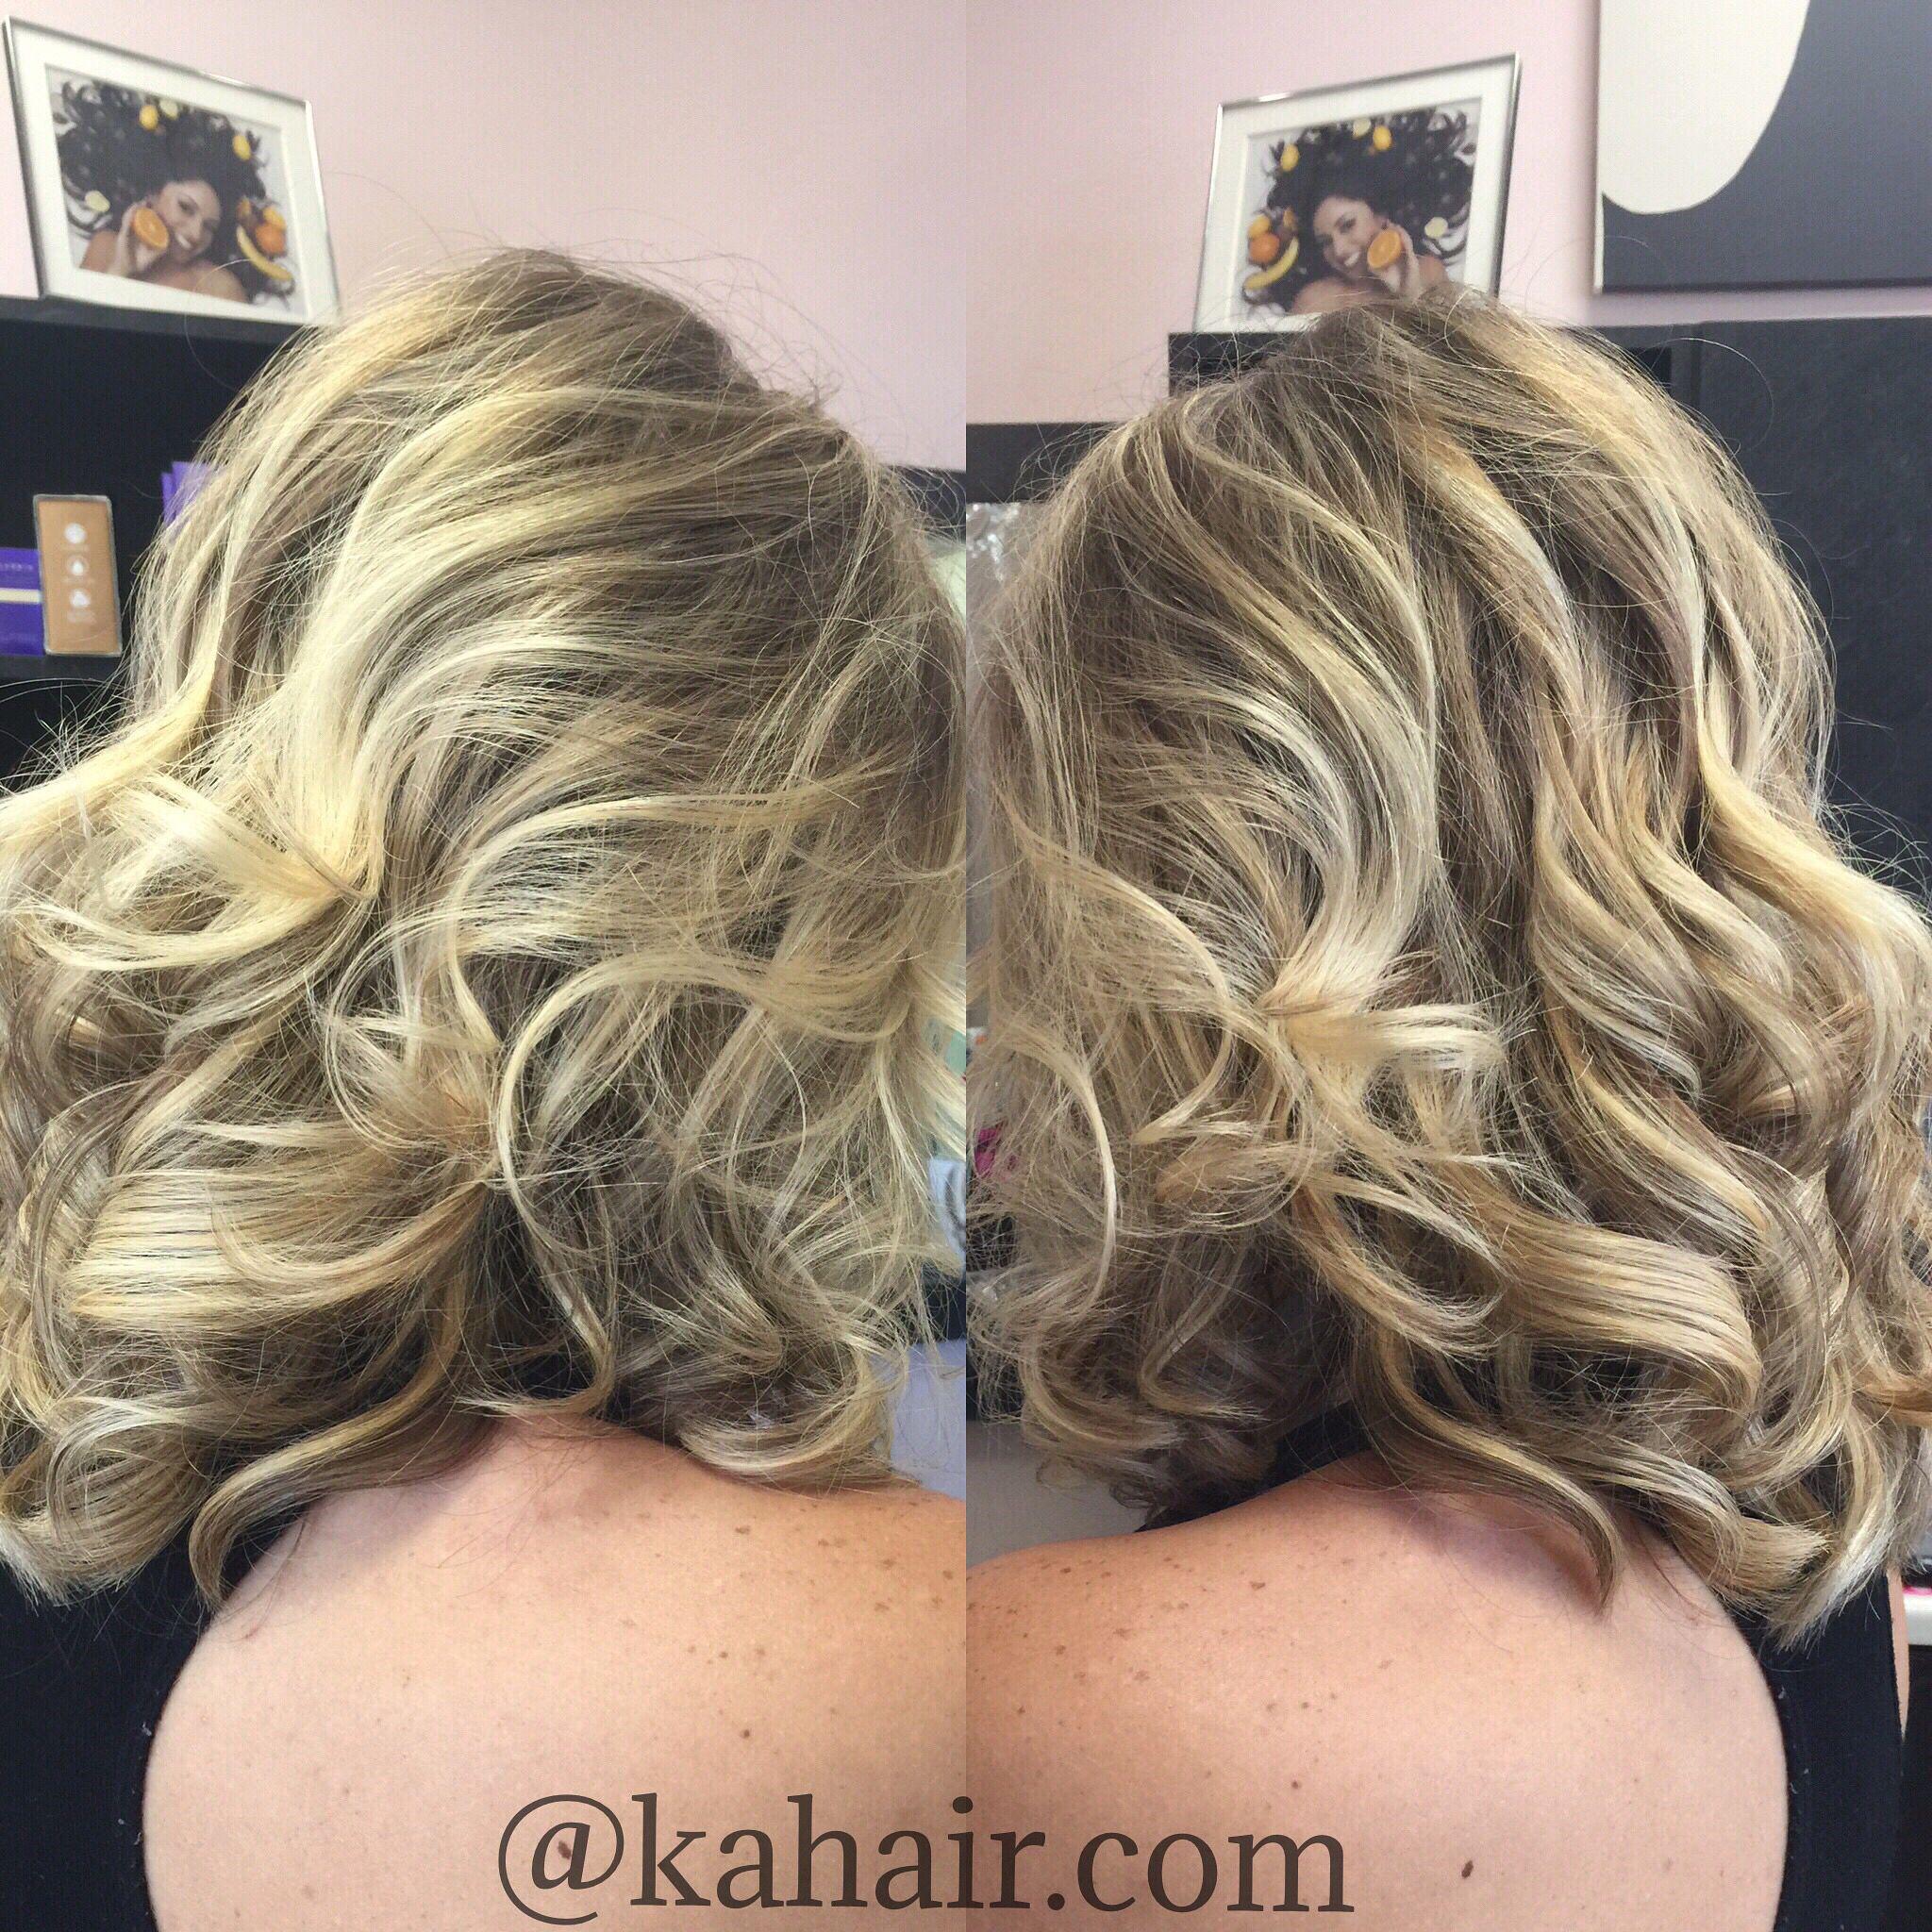 Balayge long bob beach wave style by kahair blonde hair by karla